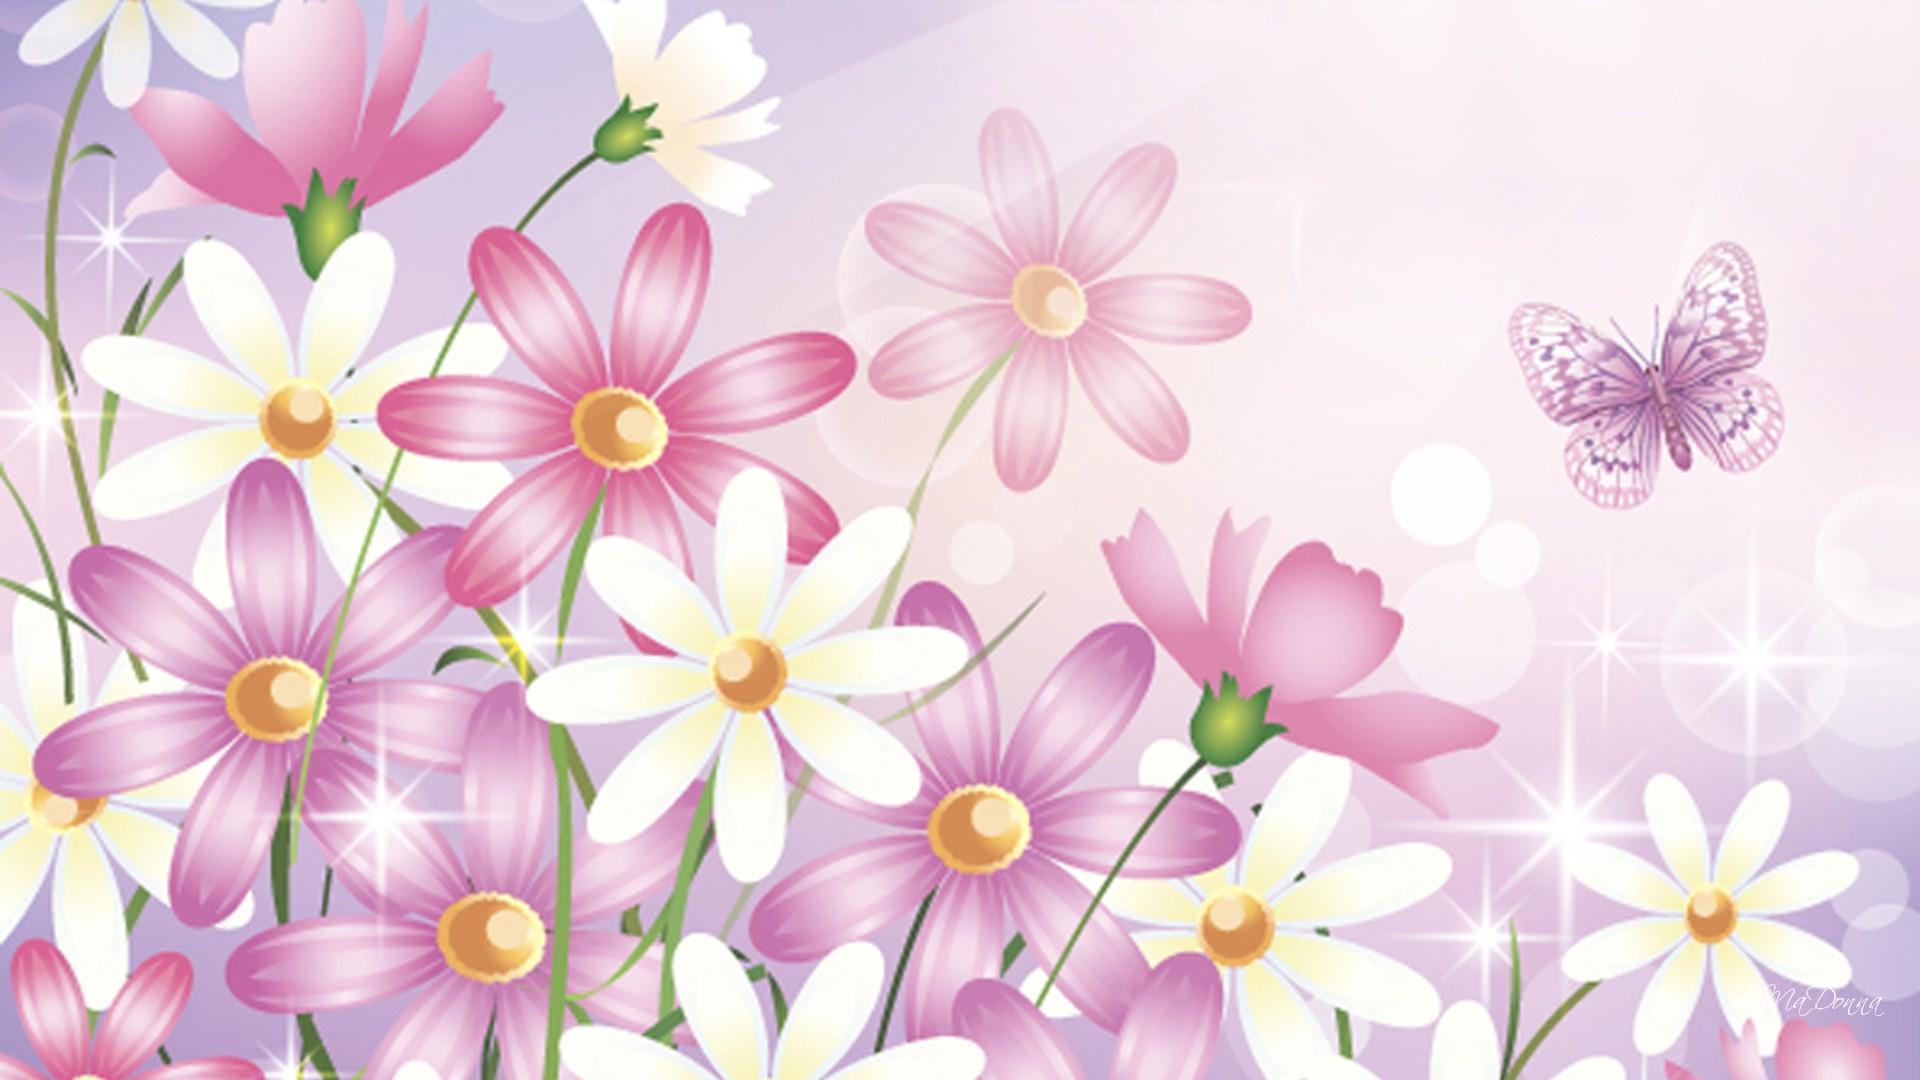 Pink And White Floral Wallpaper Wallpapersafari